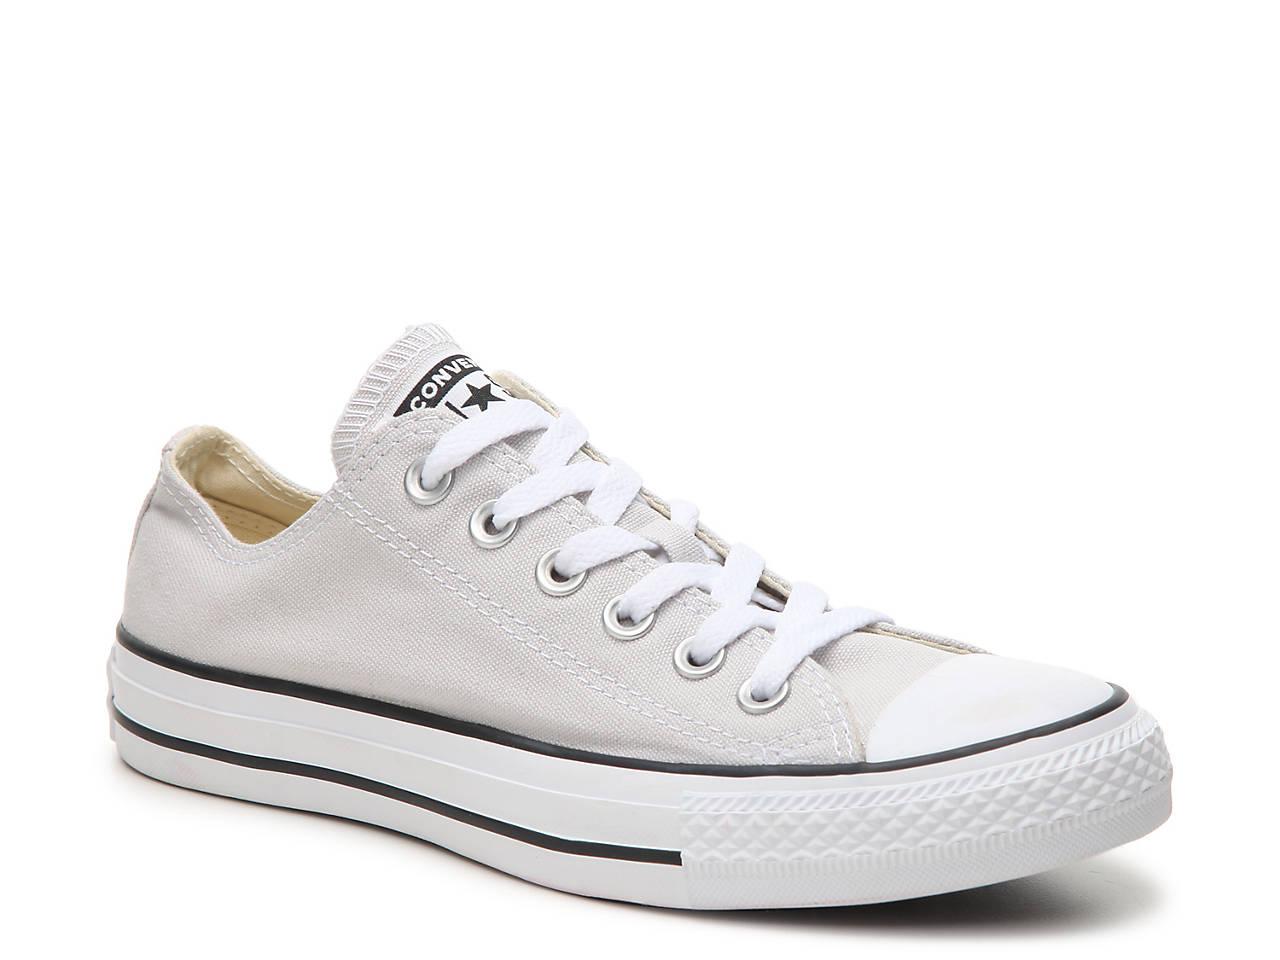 Converse Chuck Taylor All Star Ox Sneaker - Men s Men s Shoes  077a473f1